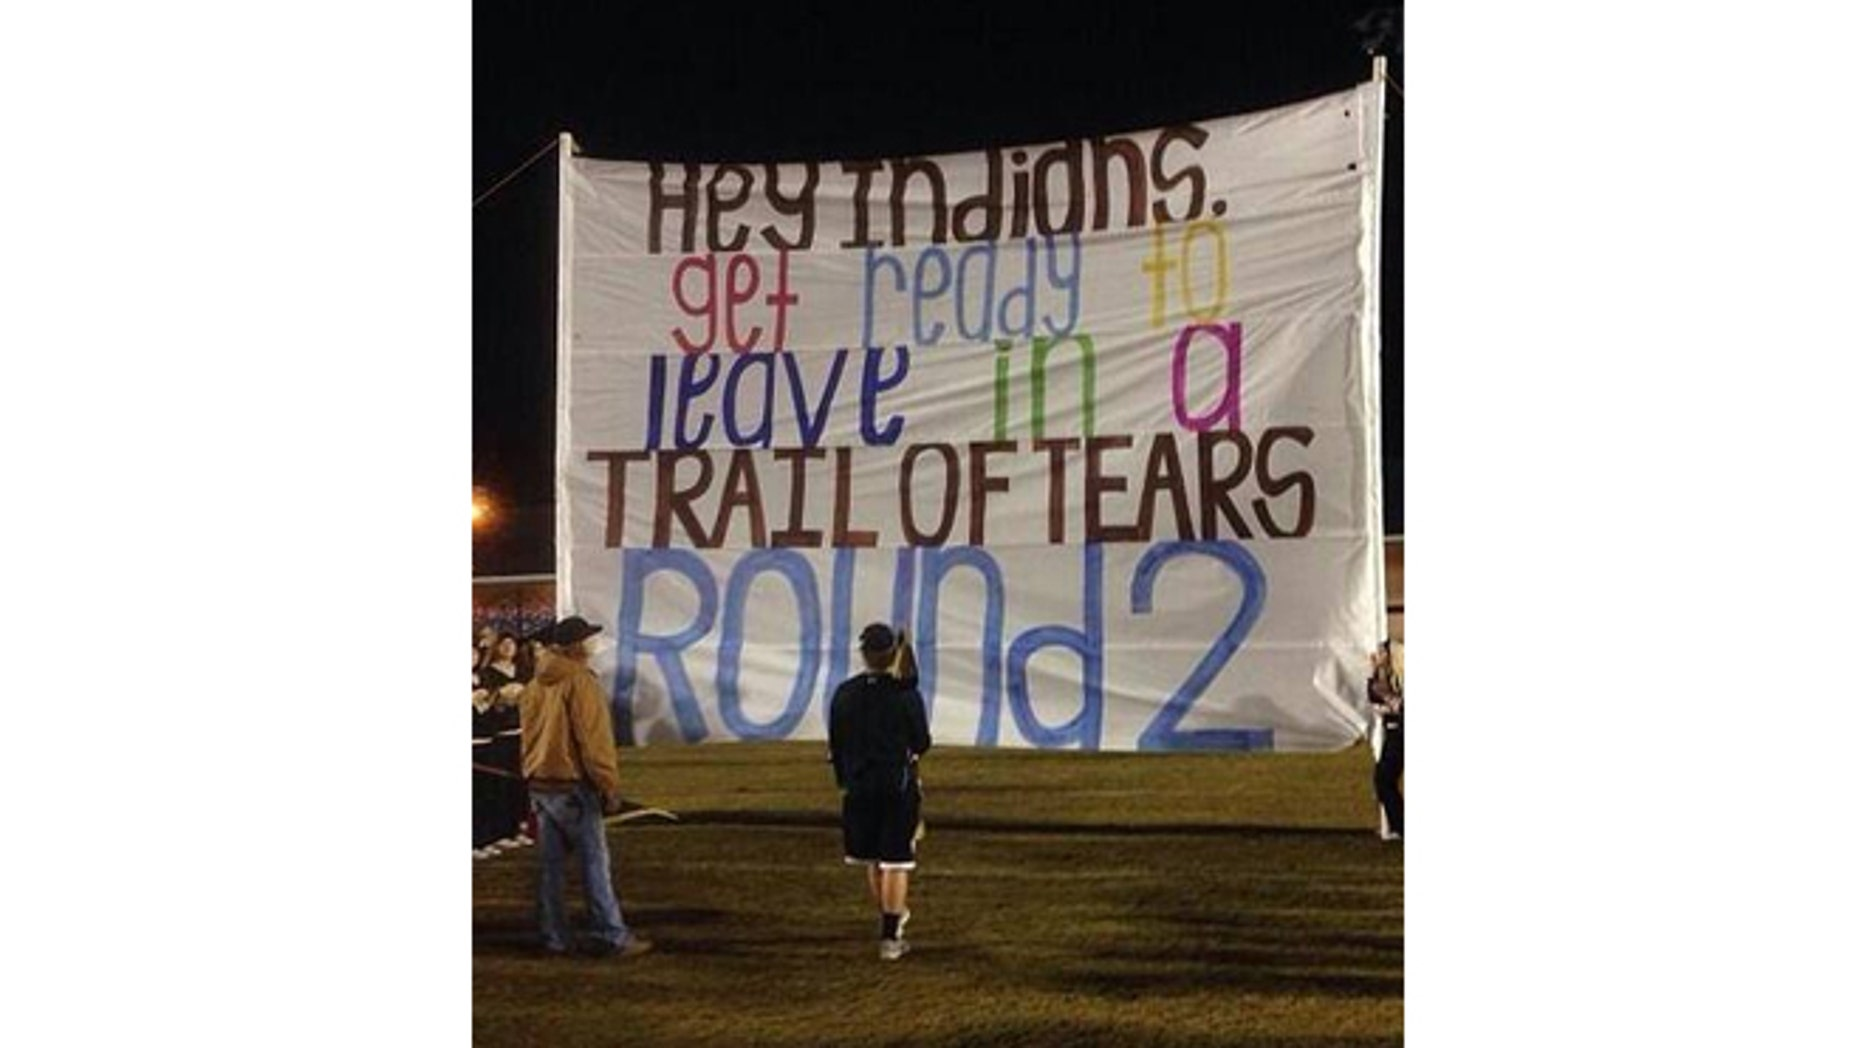 Alabama school apologizes for 'Trail of Tears' football